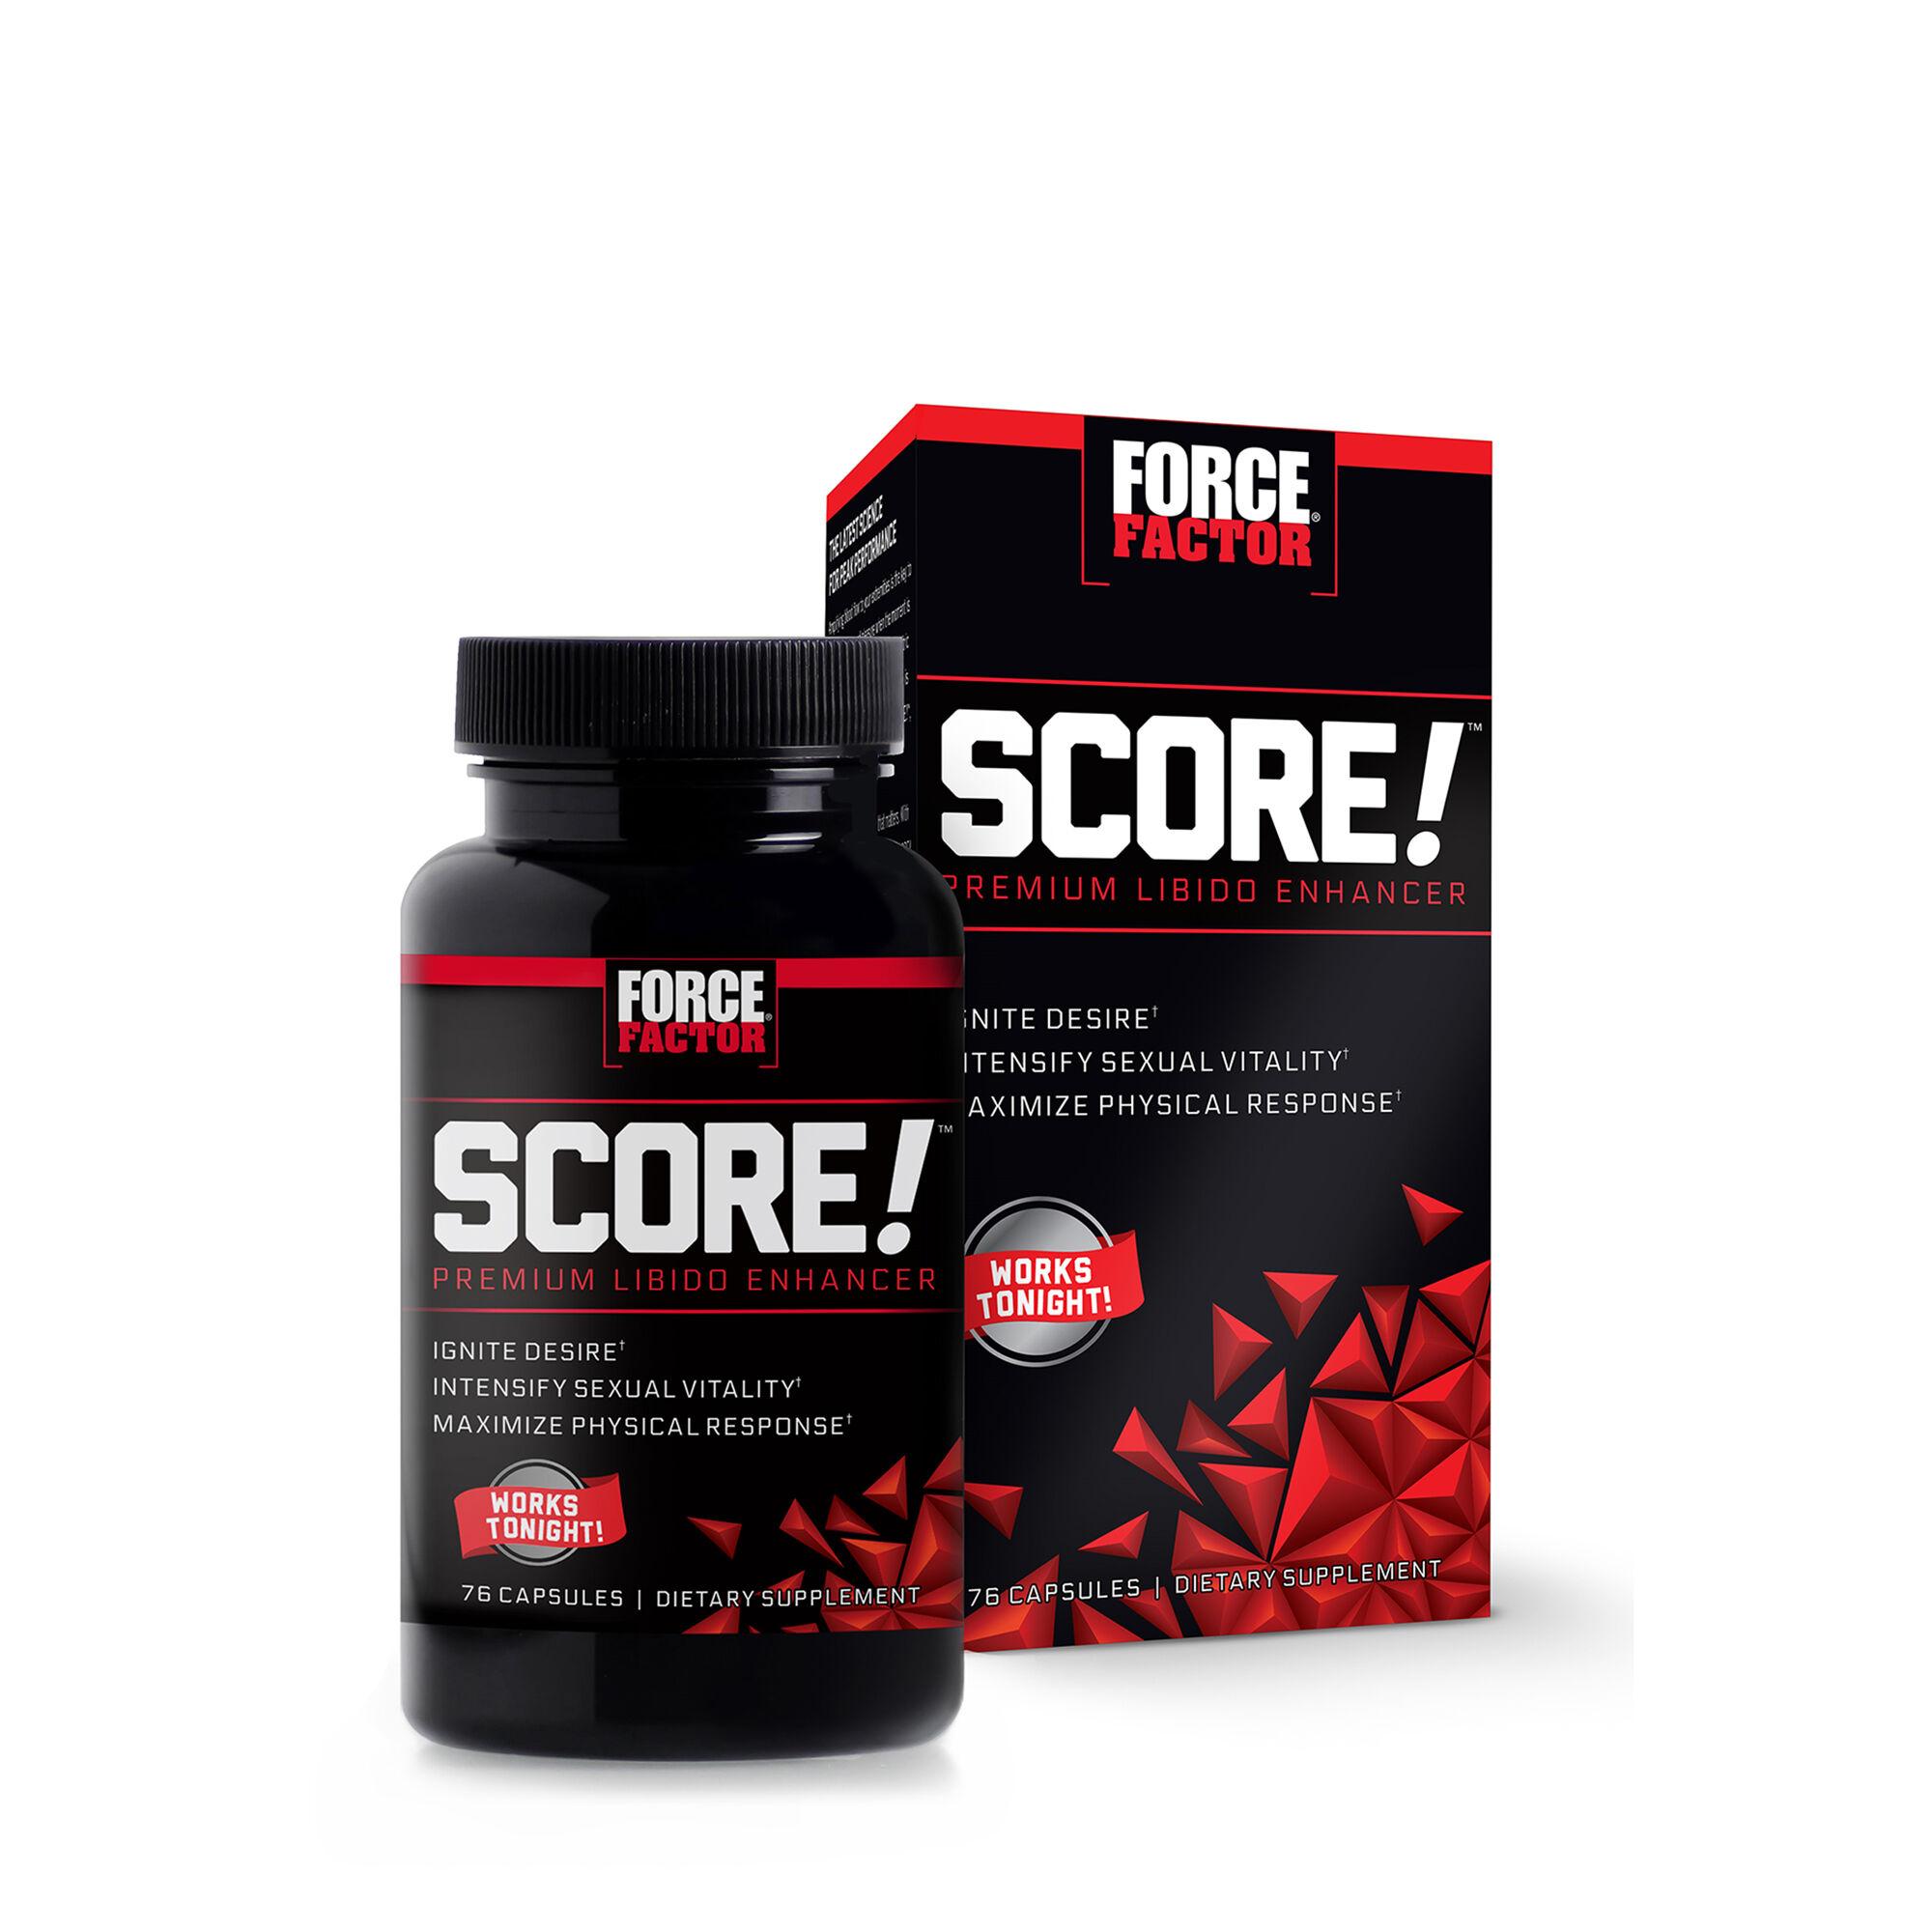 Force Factor® SCORE! Premium Libido Enhancer